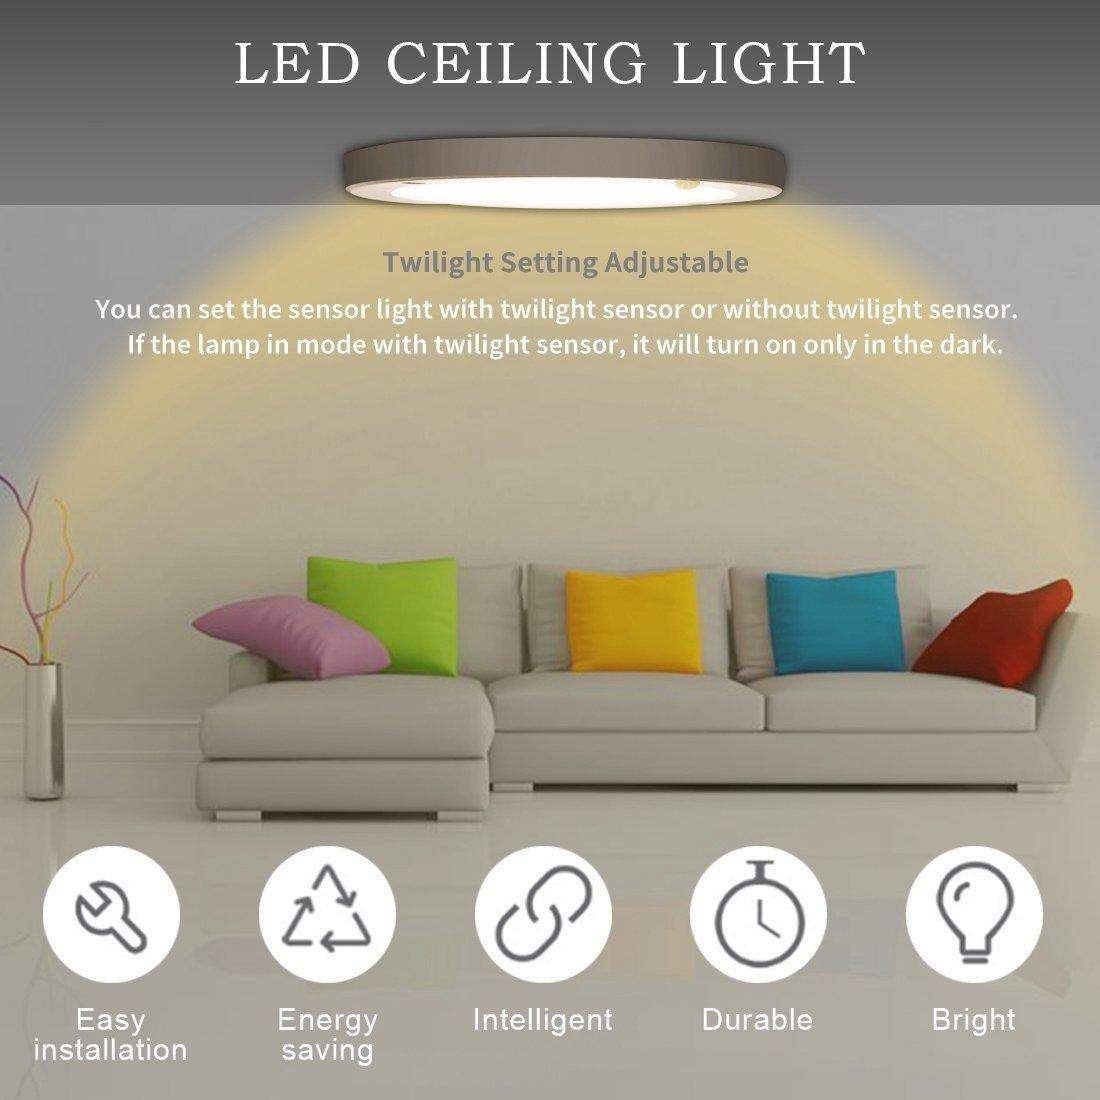 Kaday 18W Downlight LED Plafón con sensor de movimiento Lámpara de pared Techo Foco Empotrable,1200 LM,3000K Blanco cálido: Amazon.es: Iluminación